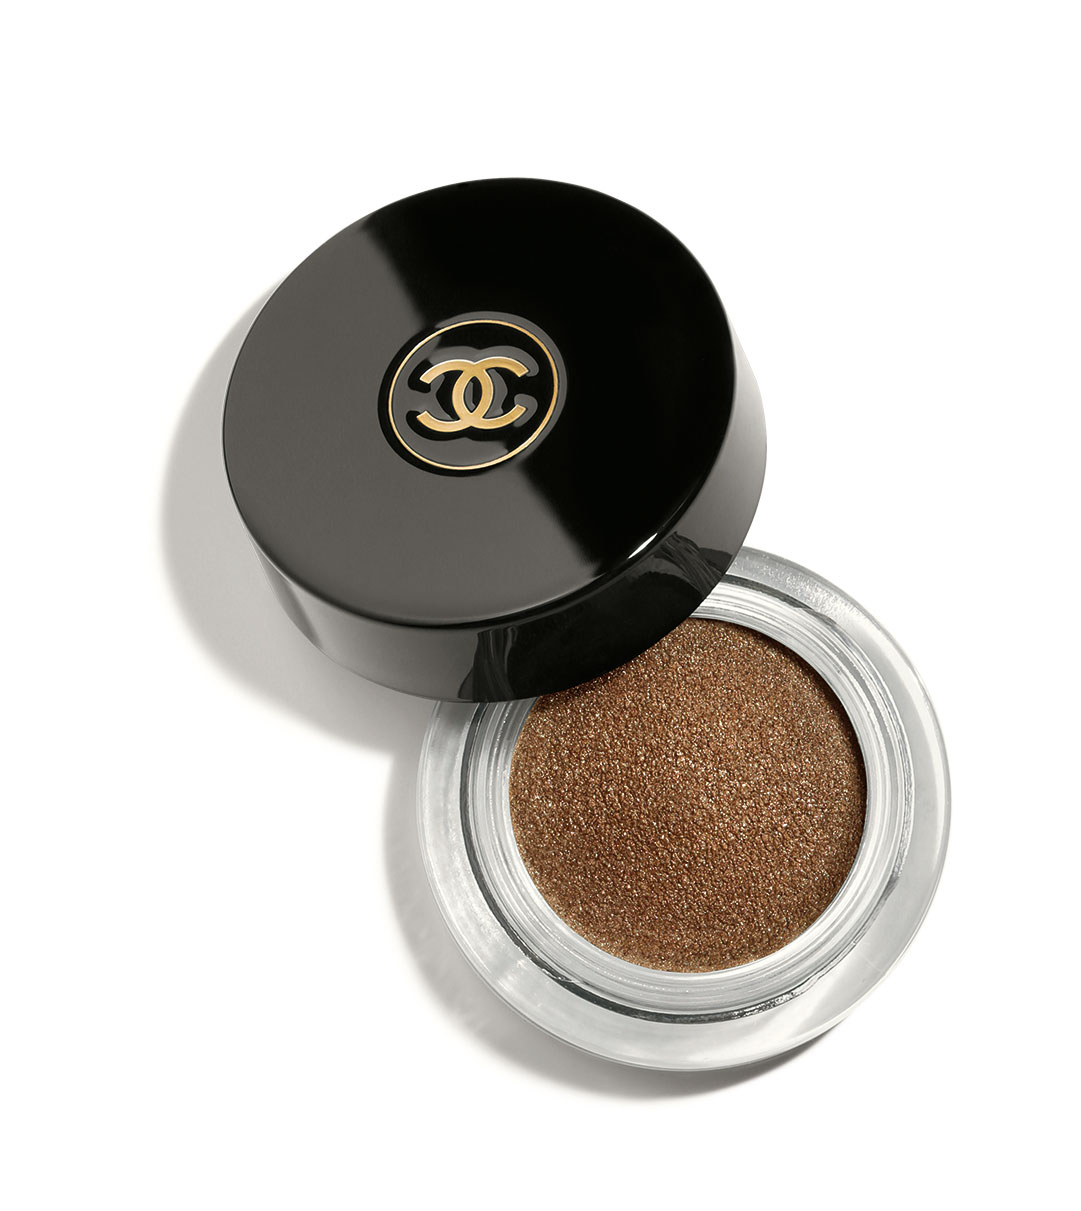 Chanel SS19 Make-up: Eyeshadow